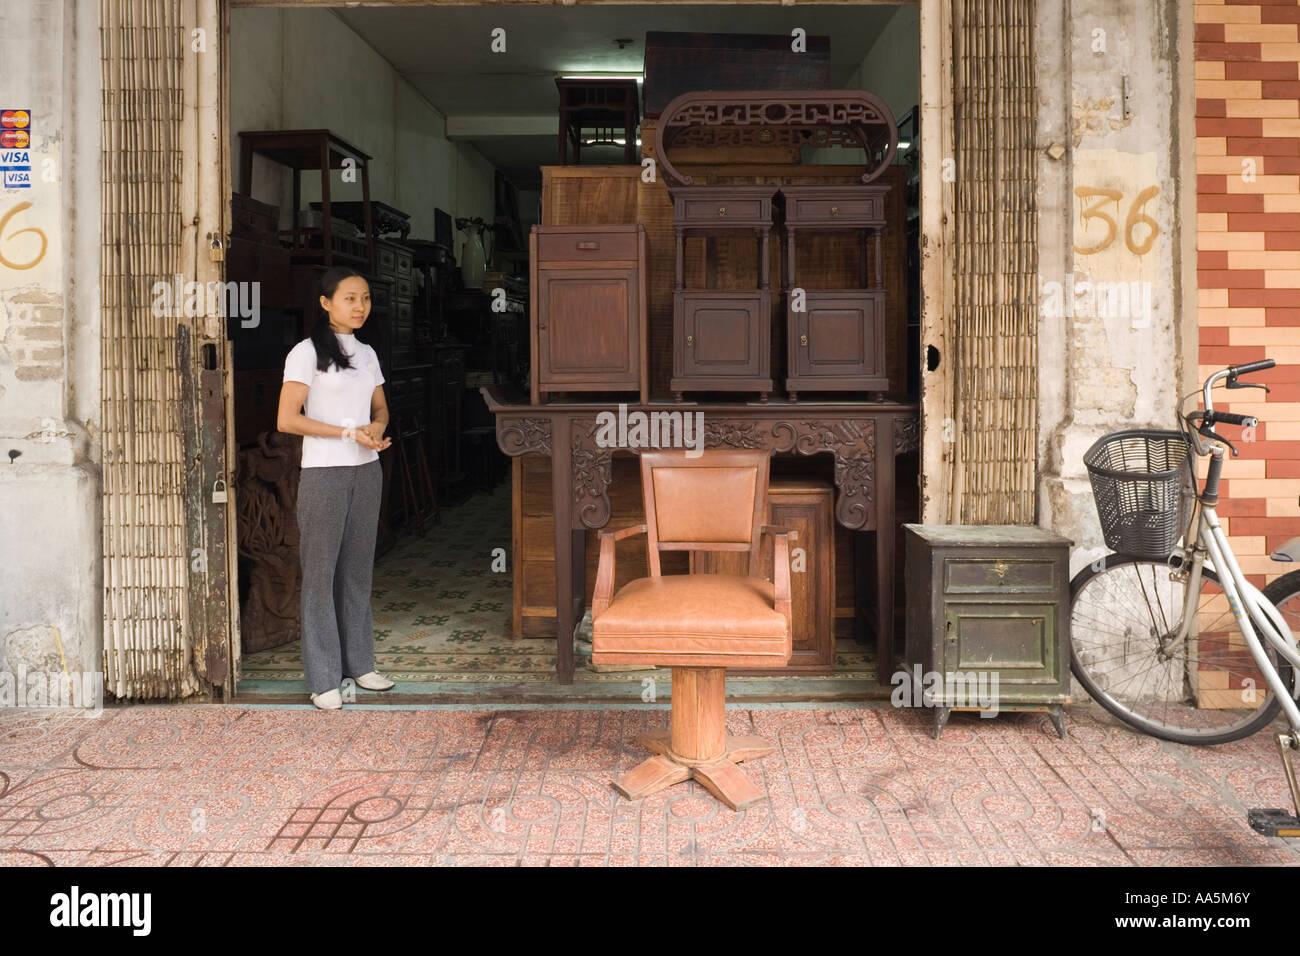 VIETNAM HO CHI MINH CITY SAIGON Antique furniture dealer at Le Cong Kieu  Street - VIETNAM HO CHI MINH CITY SAIGON Antique Furniture Dealer At Le Cong